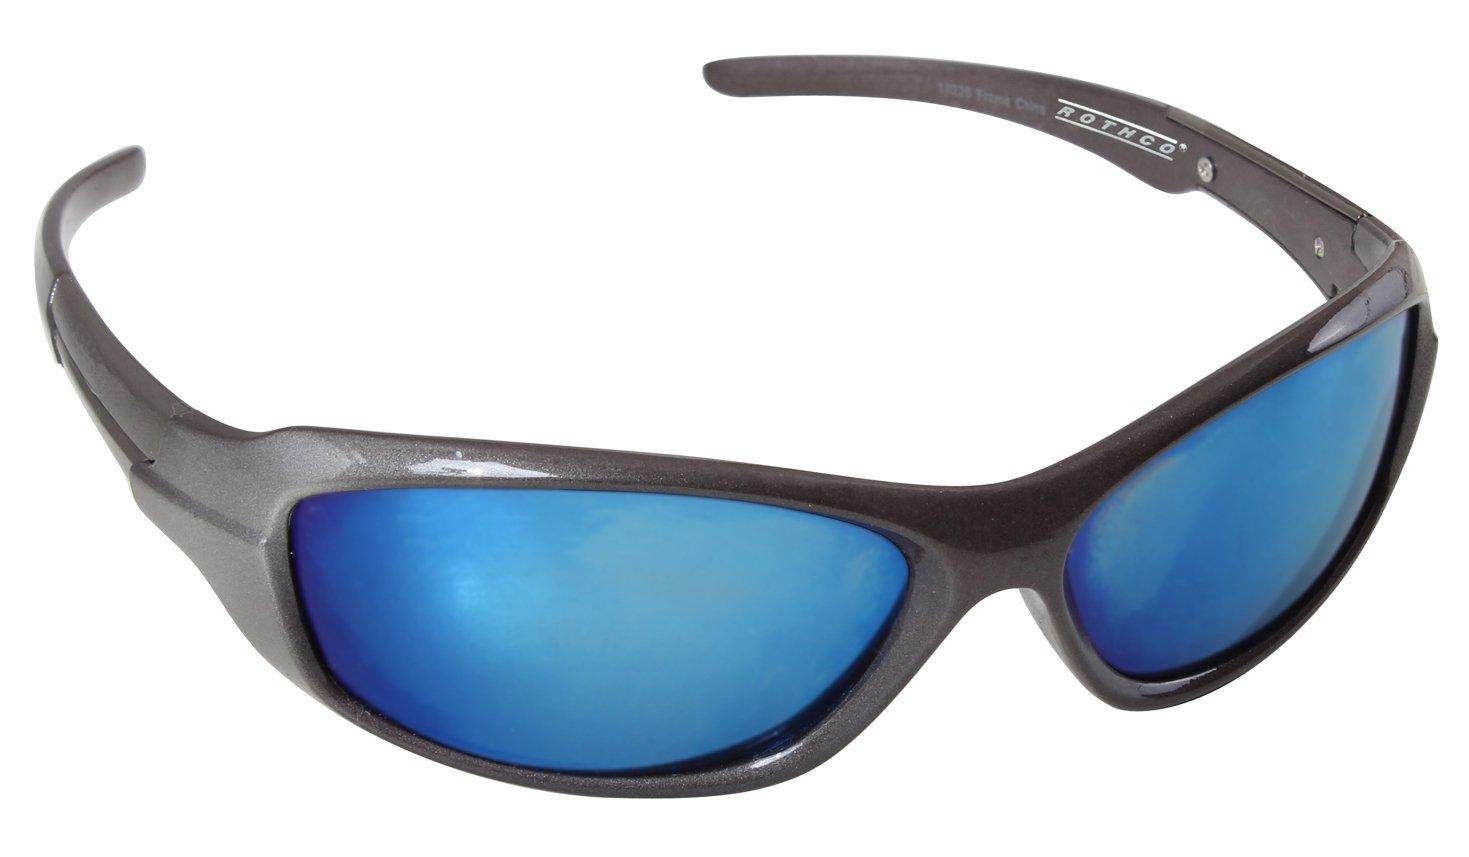 Rothco 9mm Sunglasses, Gray Frame/Mirror Lens